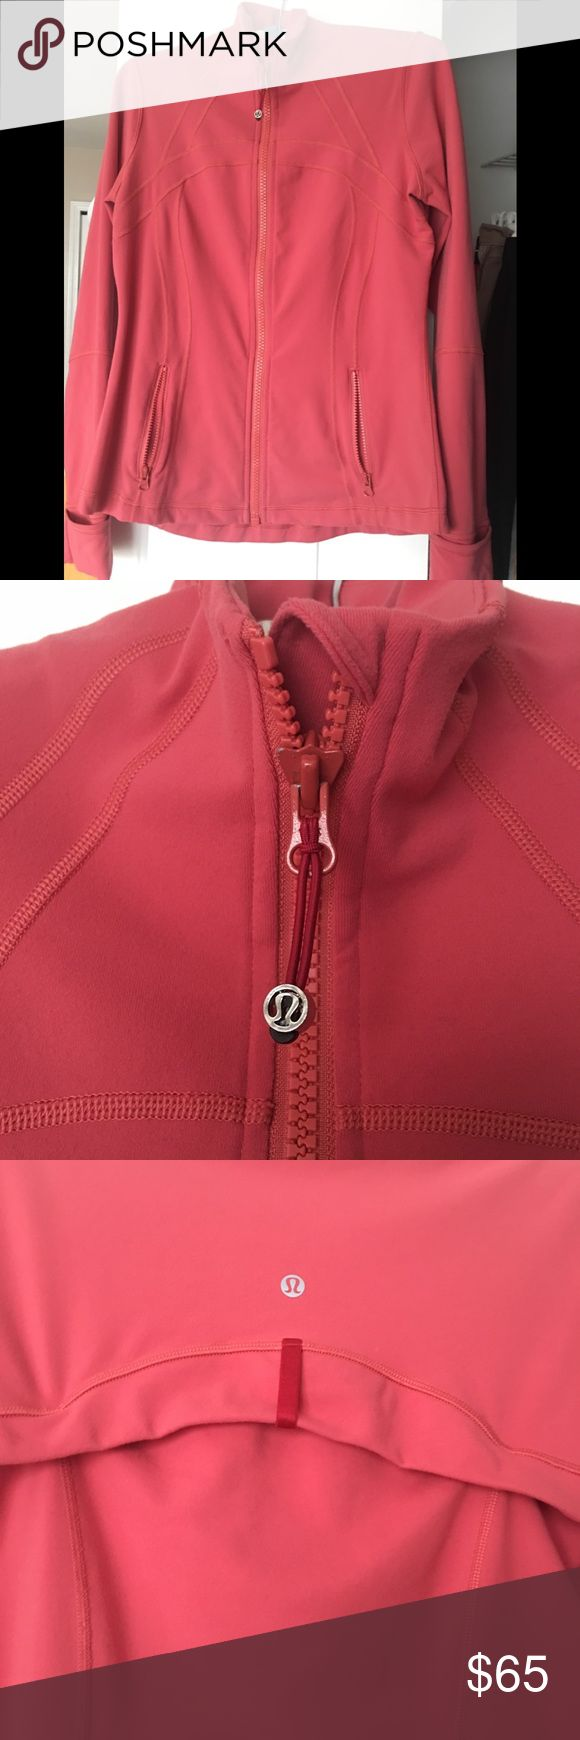 lululemon Zip Up Dark Peach color Zip up 'Define' jacket lululemon athletica Other